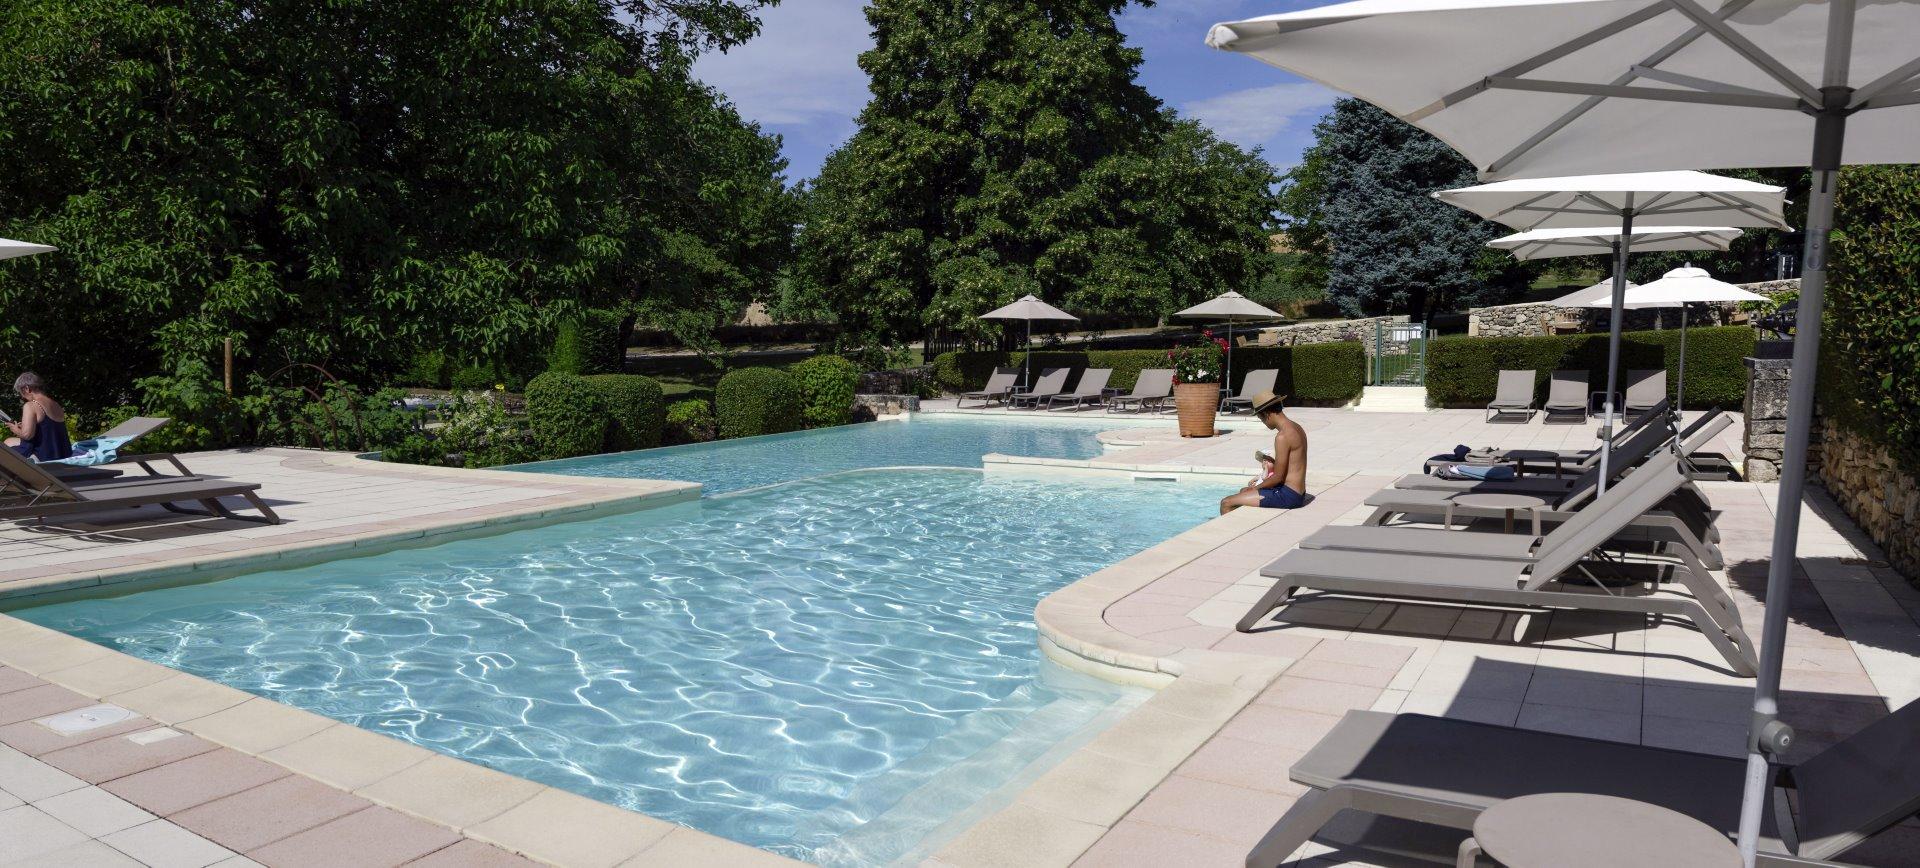 20 piscine